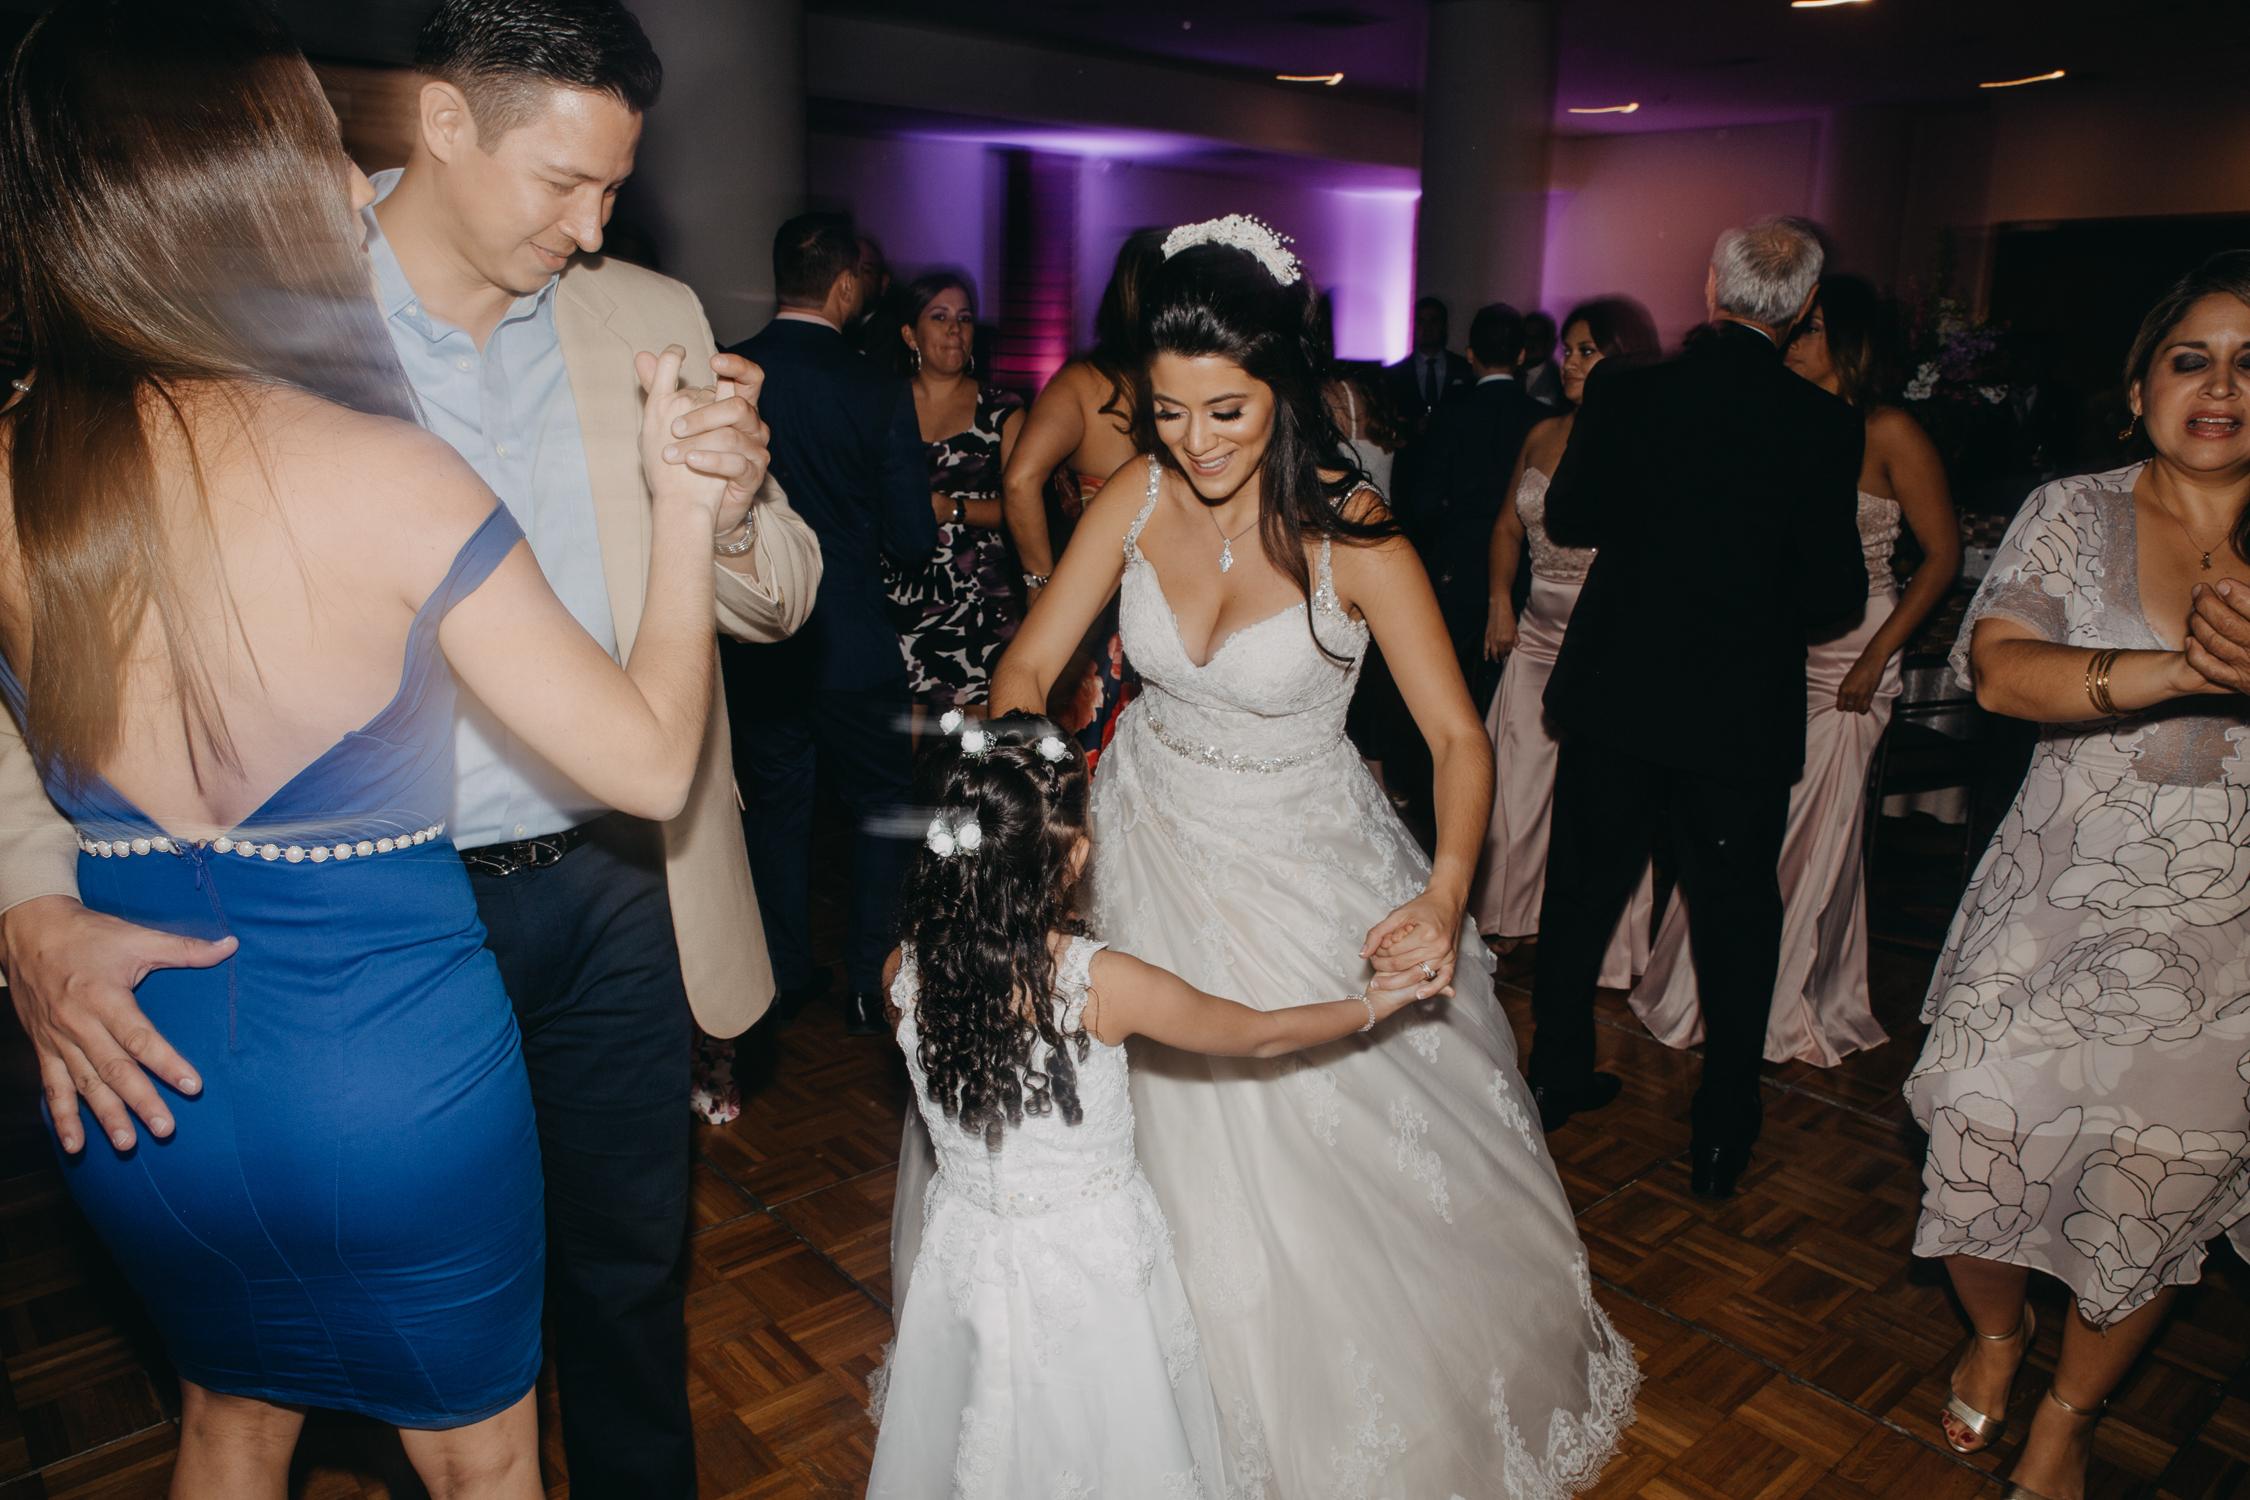 Michelle-Agurto-Fotografia-Bodas-Ecuador-Destination-Wedding-Photographer-Daniela-Dirk-75.JPG